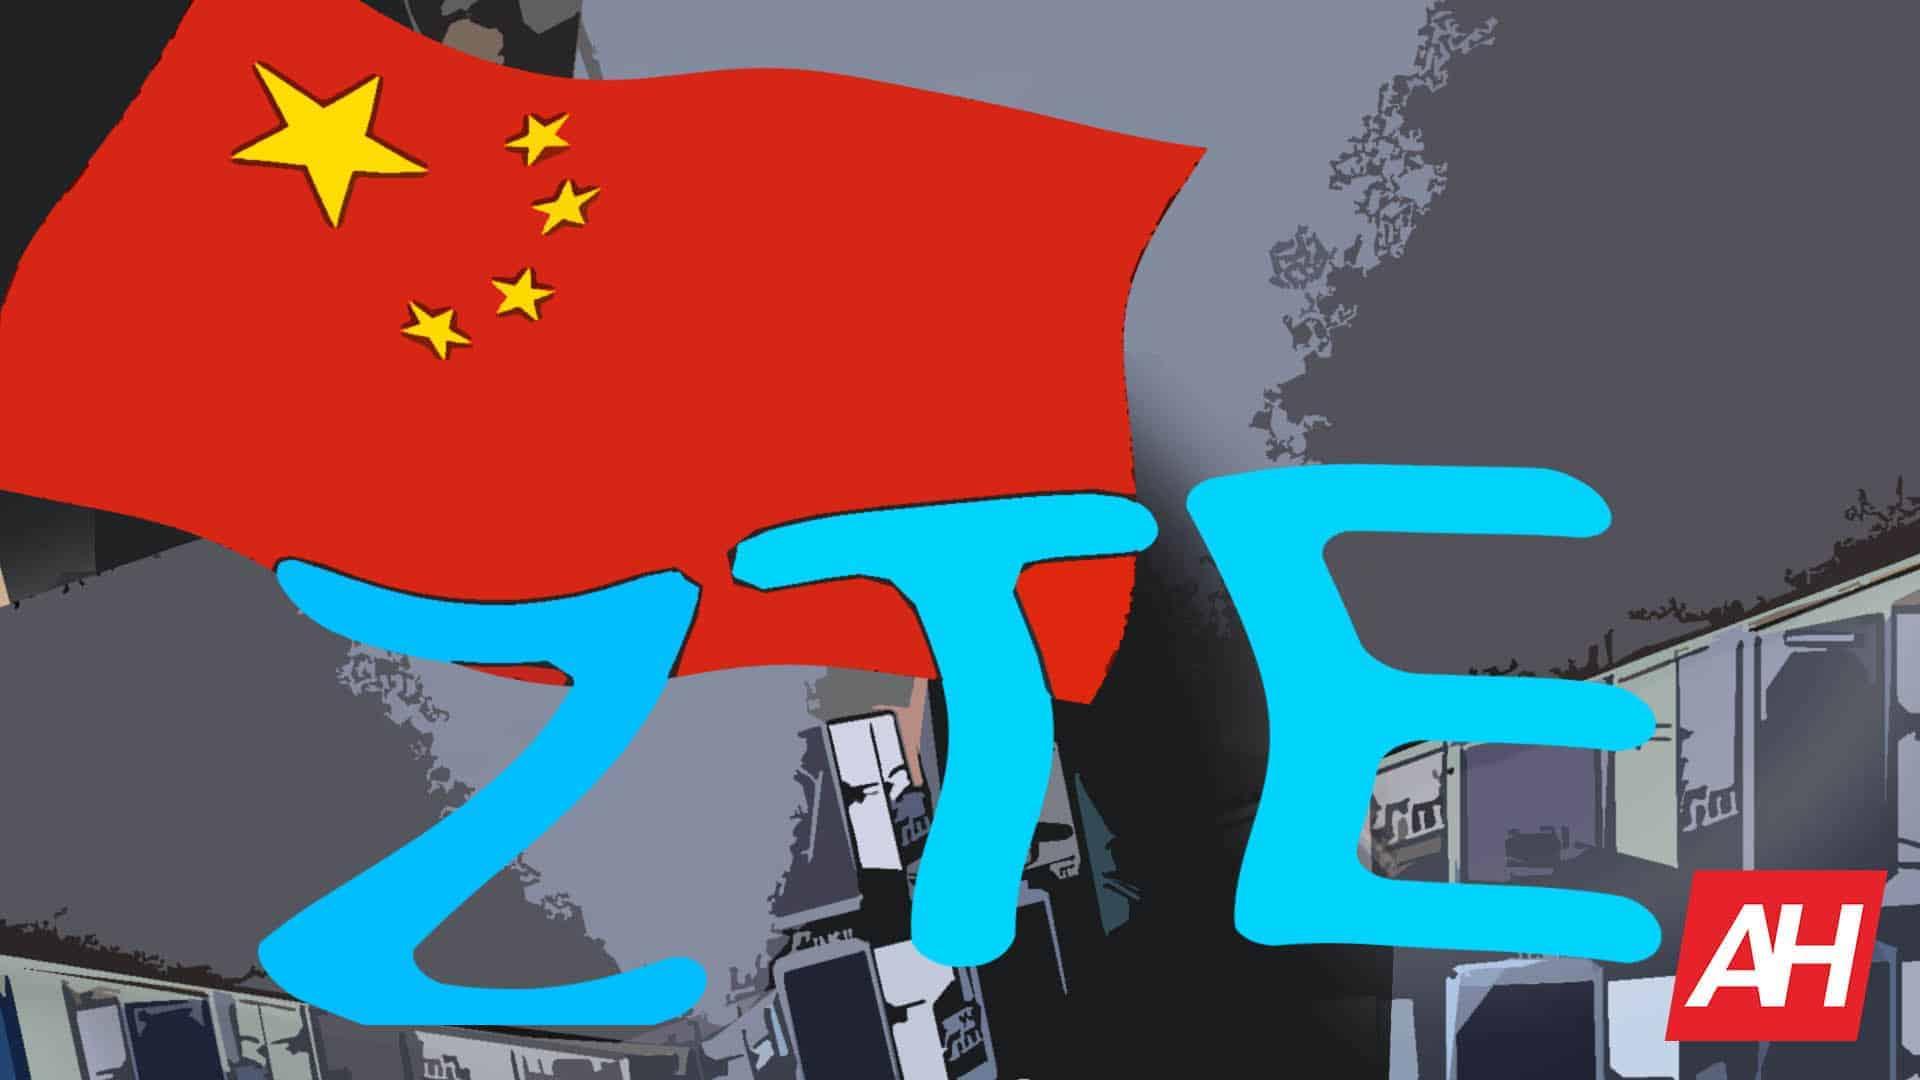 ZTE Logo China Flag Illustration AH March 14 2019